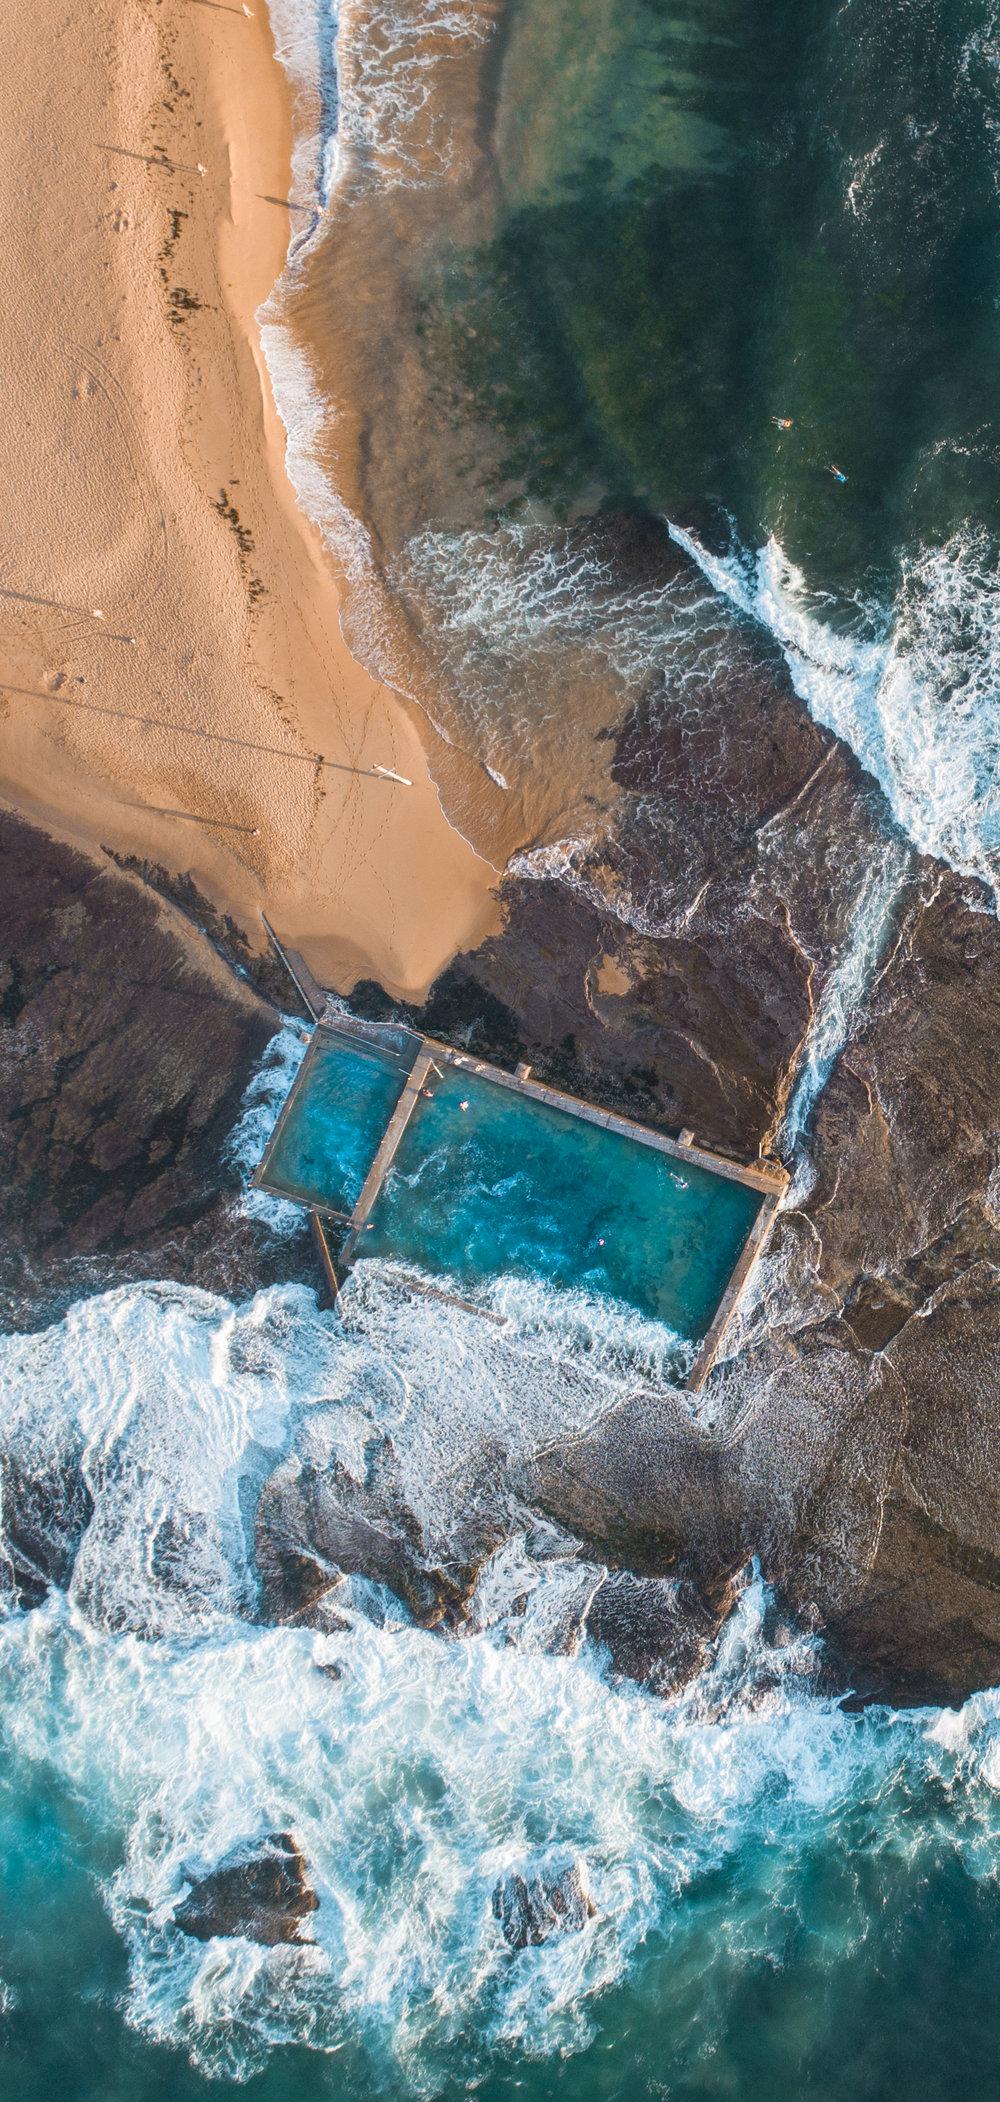 Mona Vale Beach Rock Pool, Sydney Australia